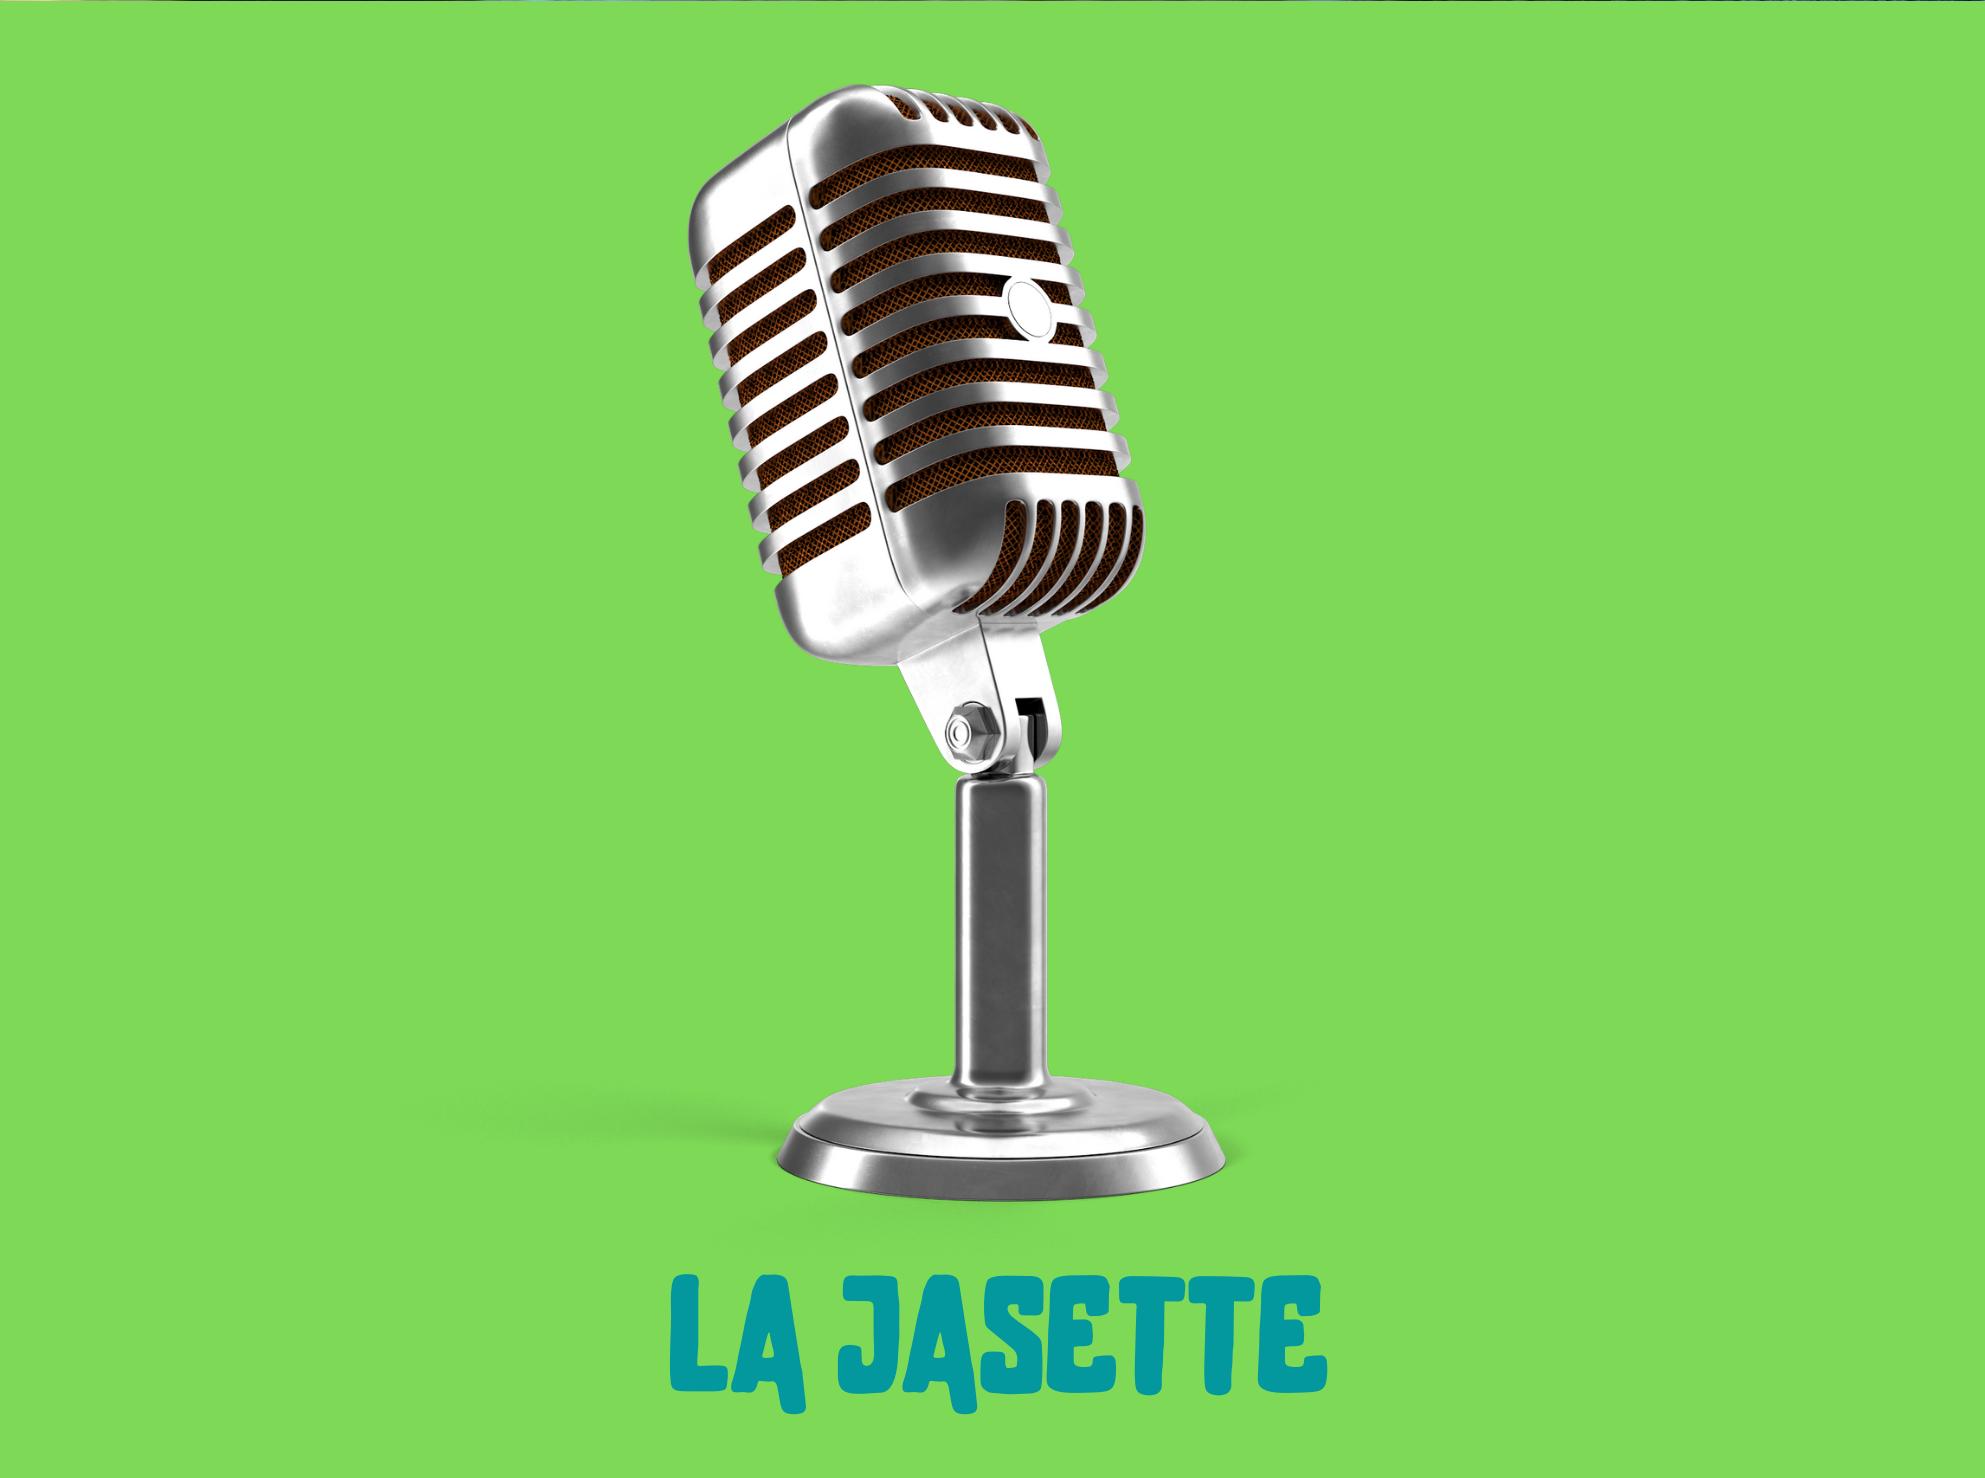 LA JASETTE